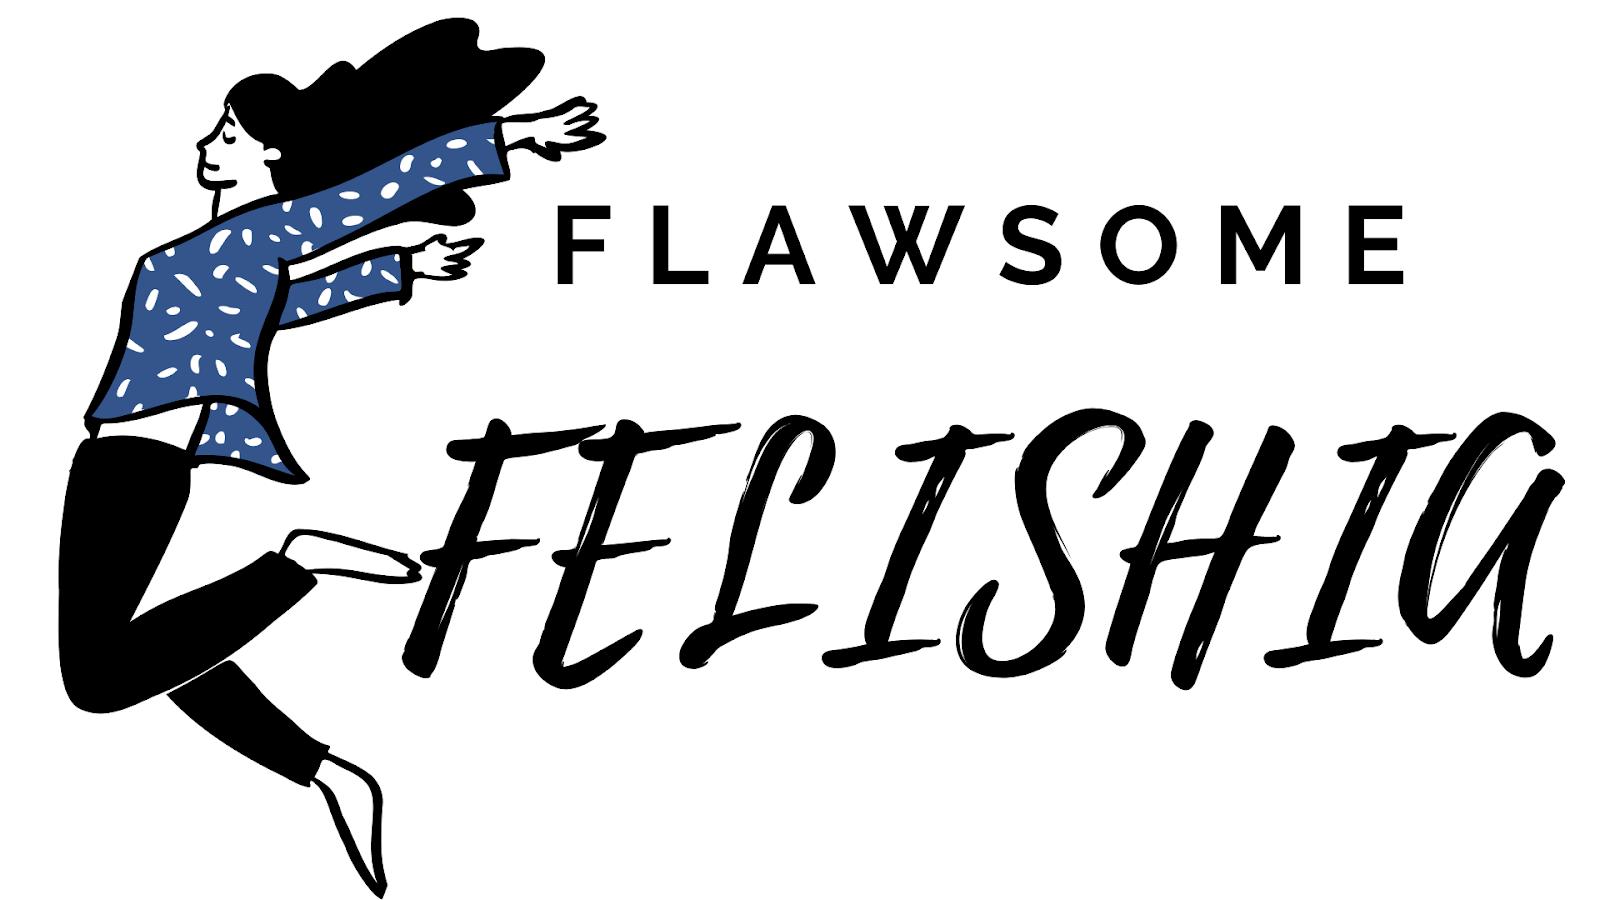 Flawsome Felishia